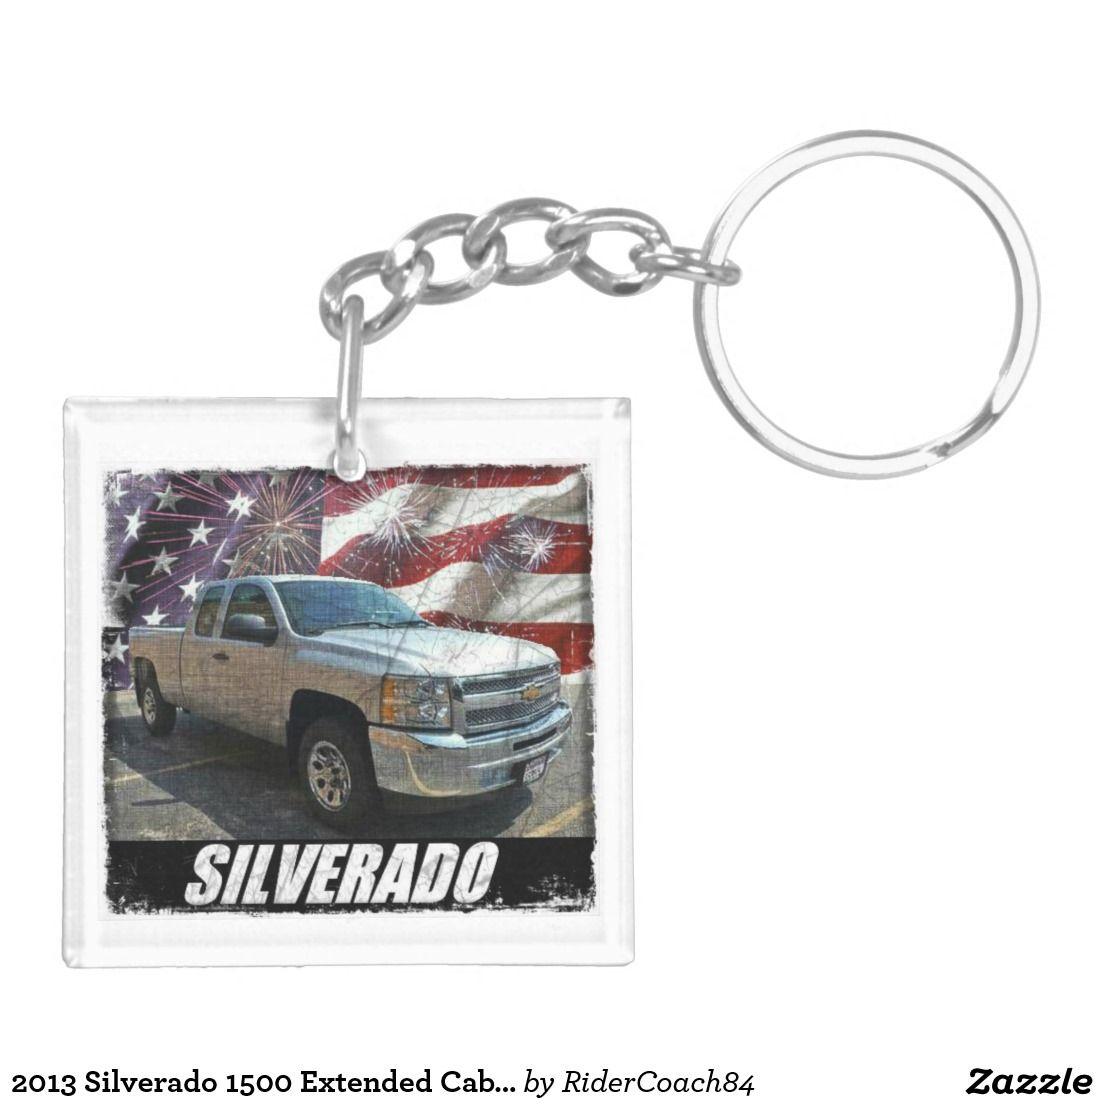 2013 Silverado 1500 Extended Cab Ls Keychain Chevrolet Pinterest Amc Gremlin Wiring Diagram